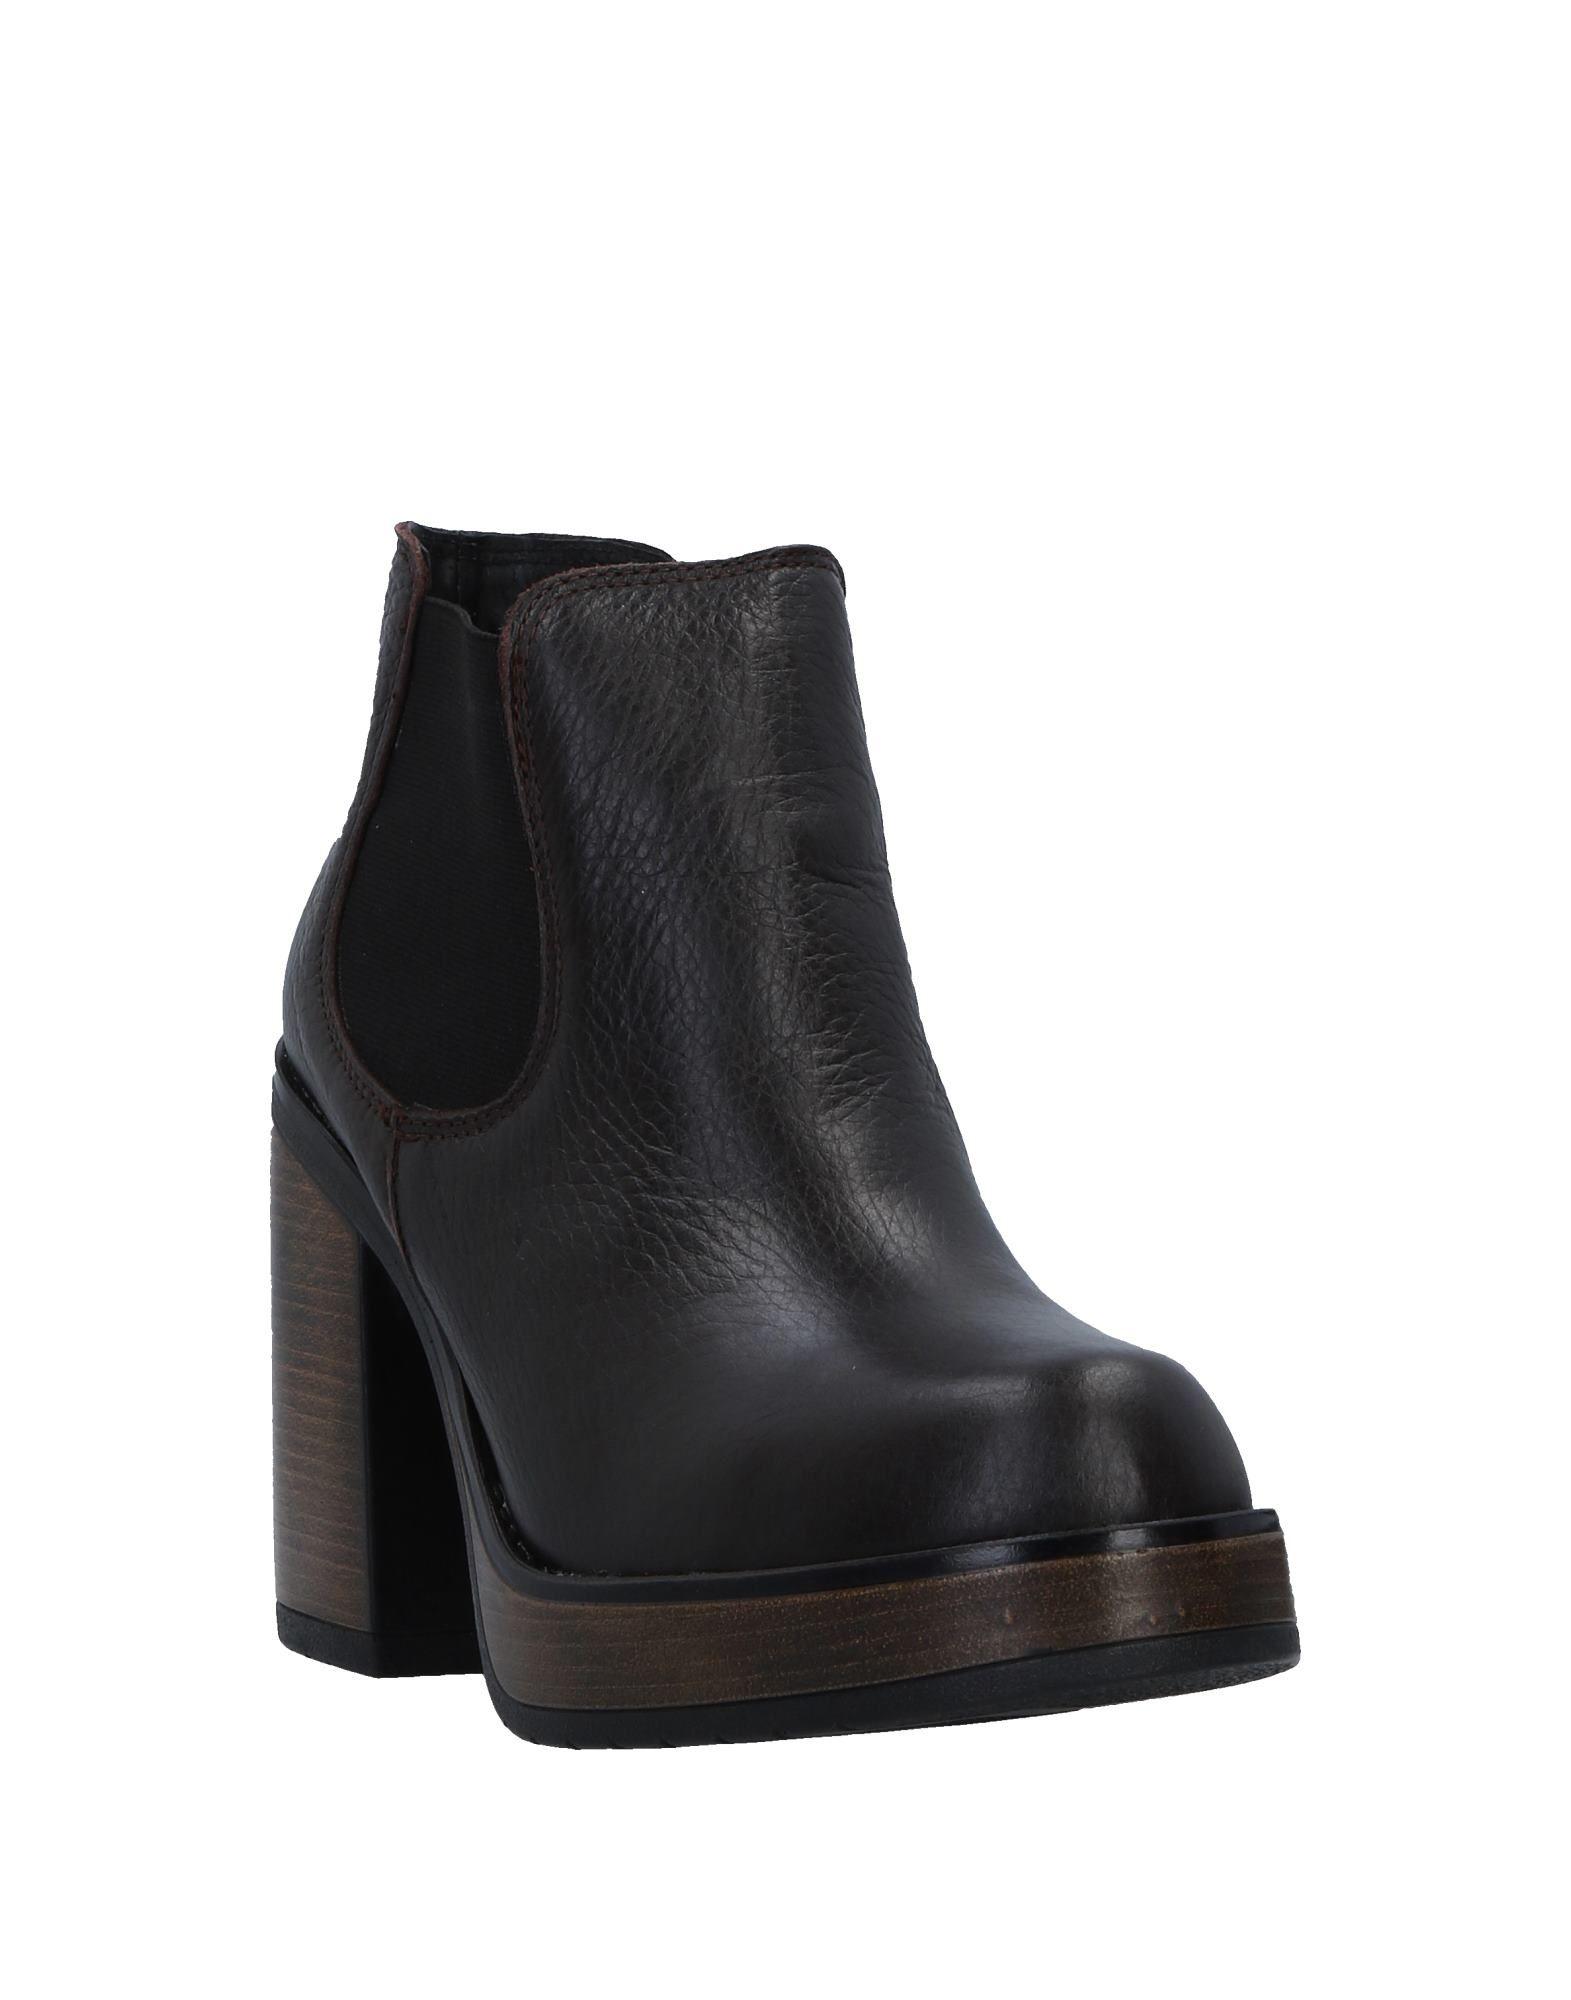 Noa A. Stiefelette Damen  beliebte 11527554XP Gute Qualität beliebte  Schuhe 11c6dd